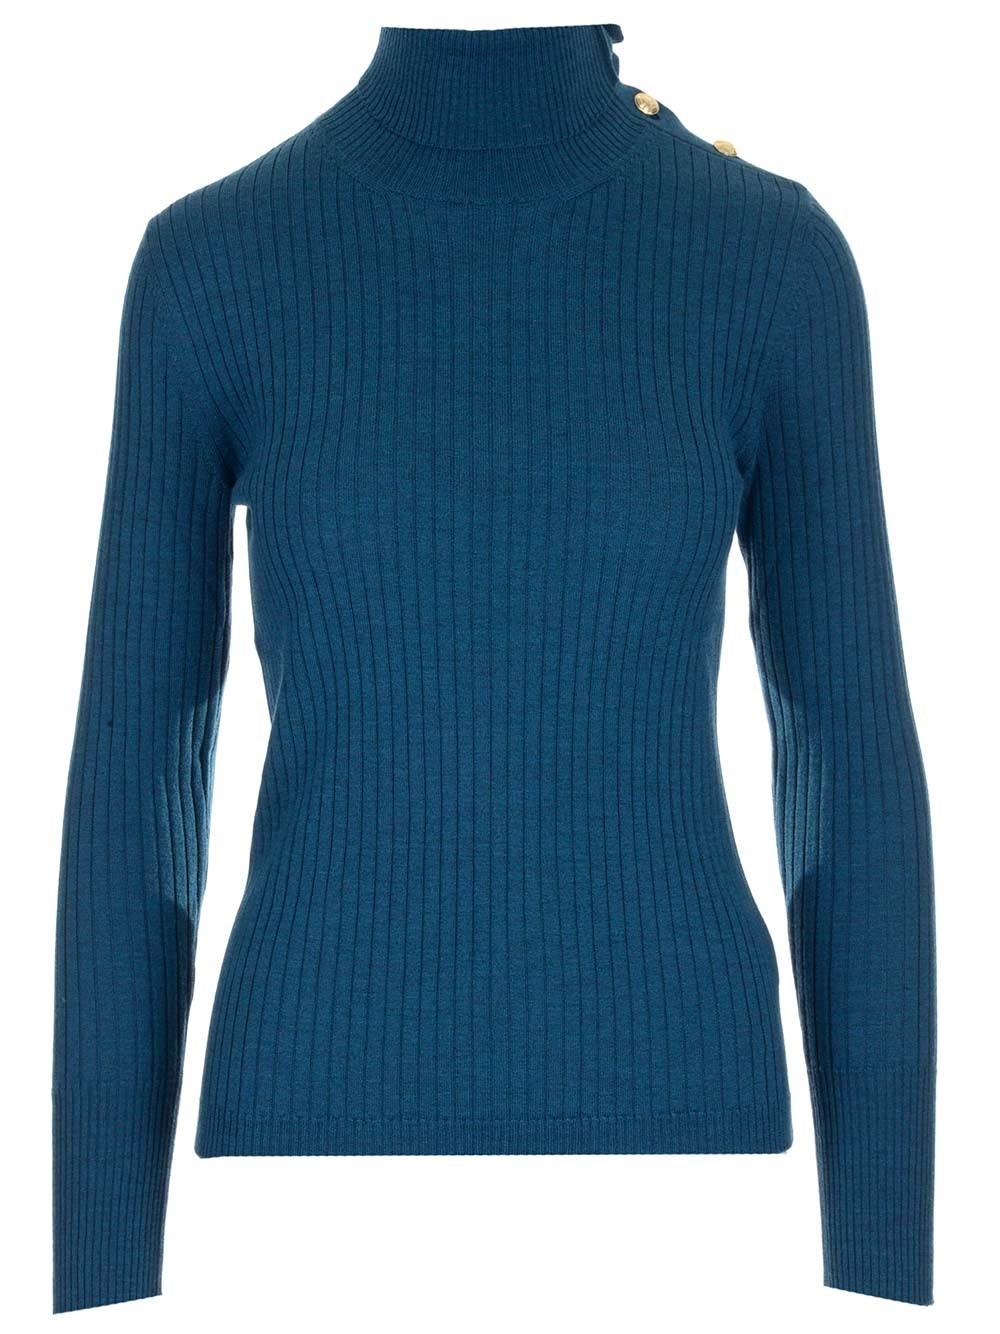 BARENA VENEZIA Ribbed Wool Sweater